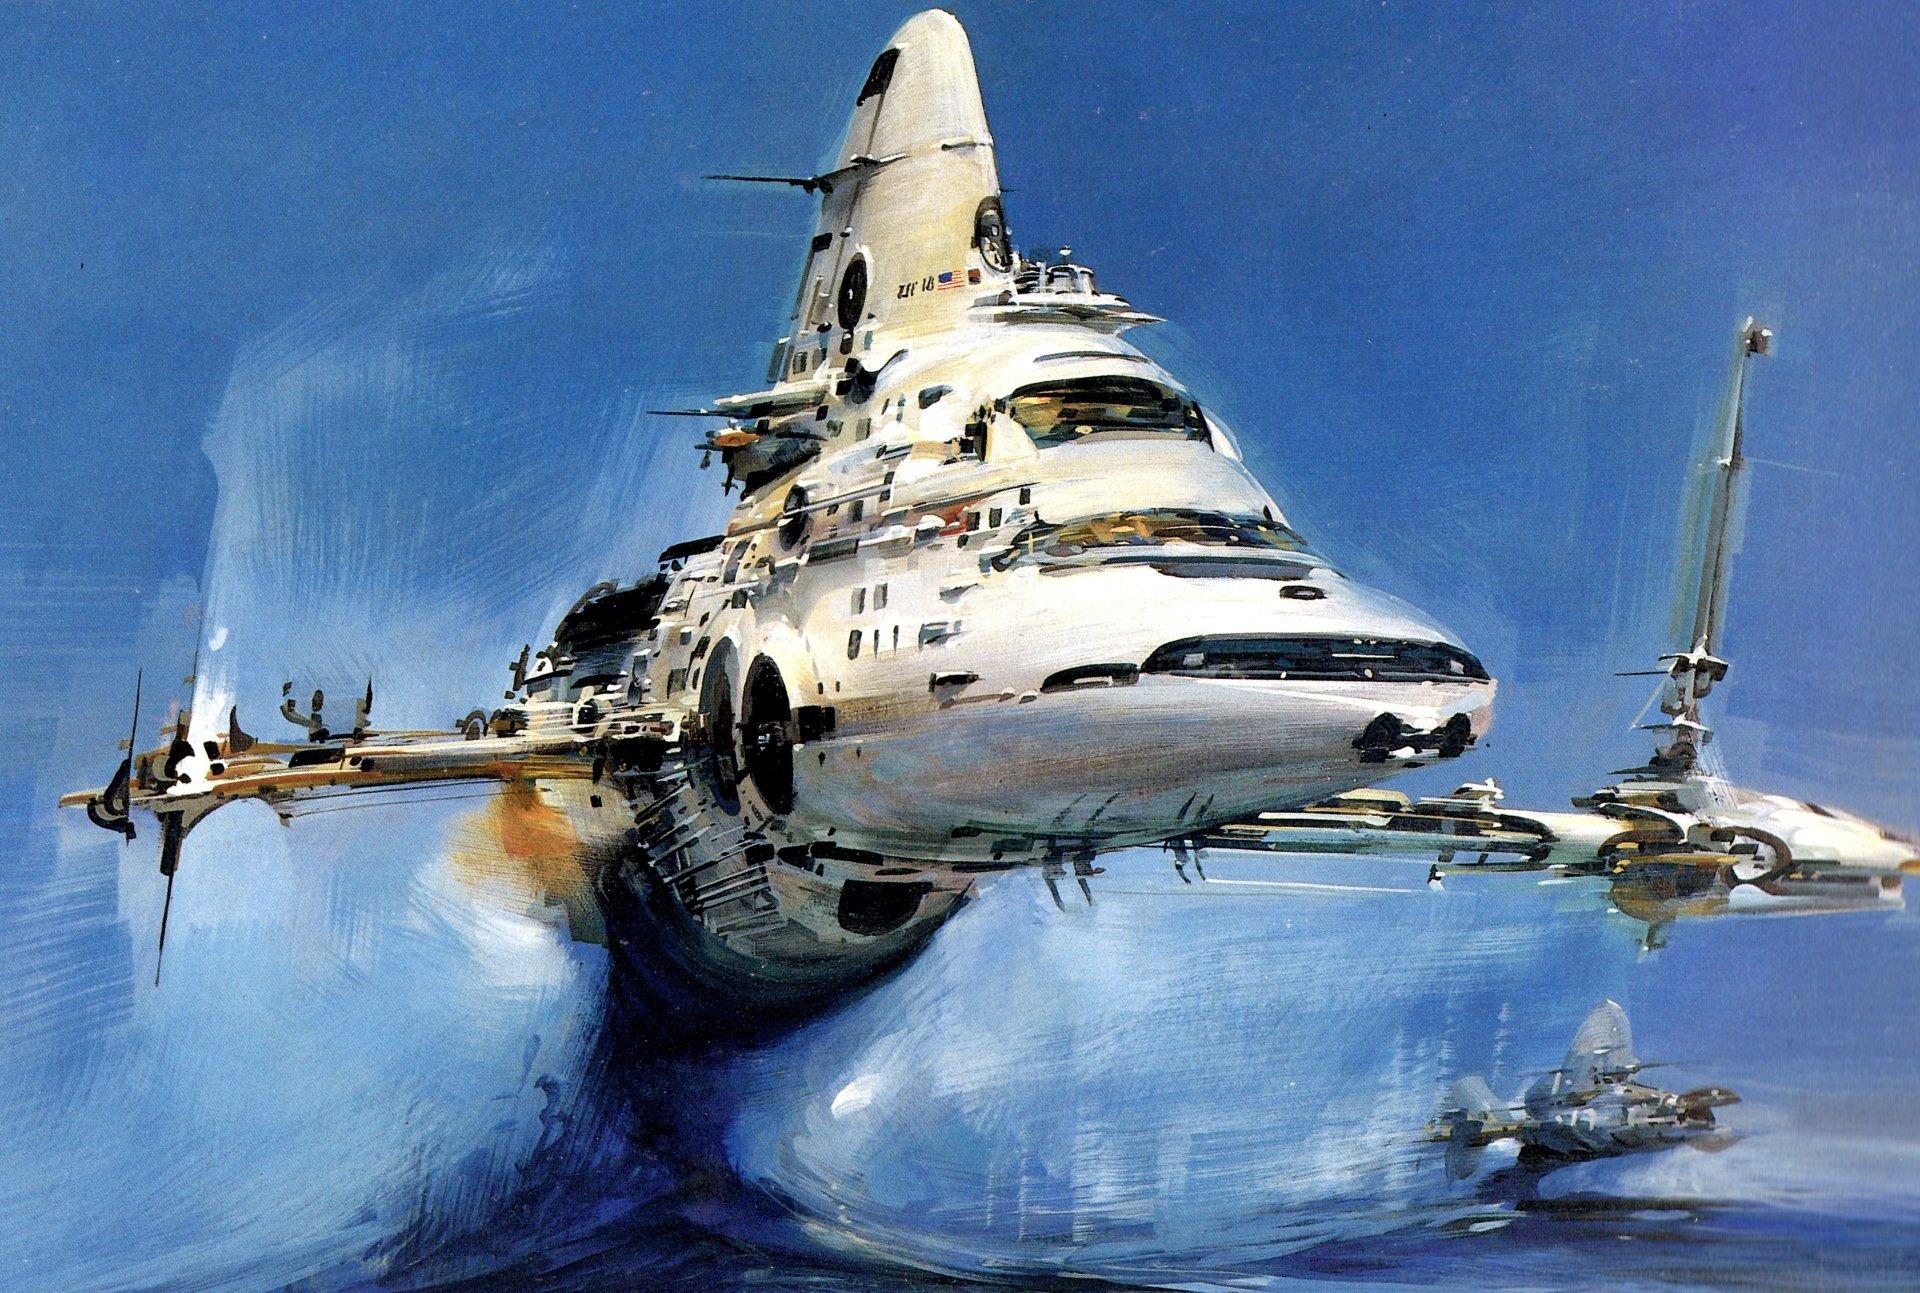 Spaceship 4k Ultra HD Wallpaper | Background Image ...